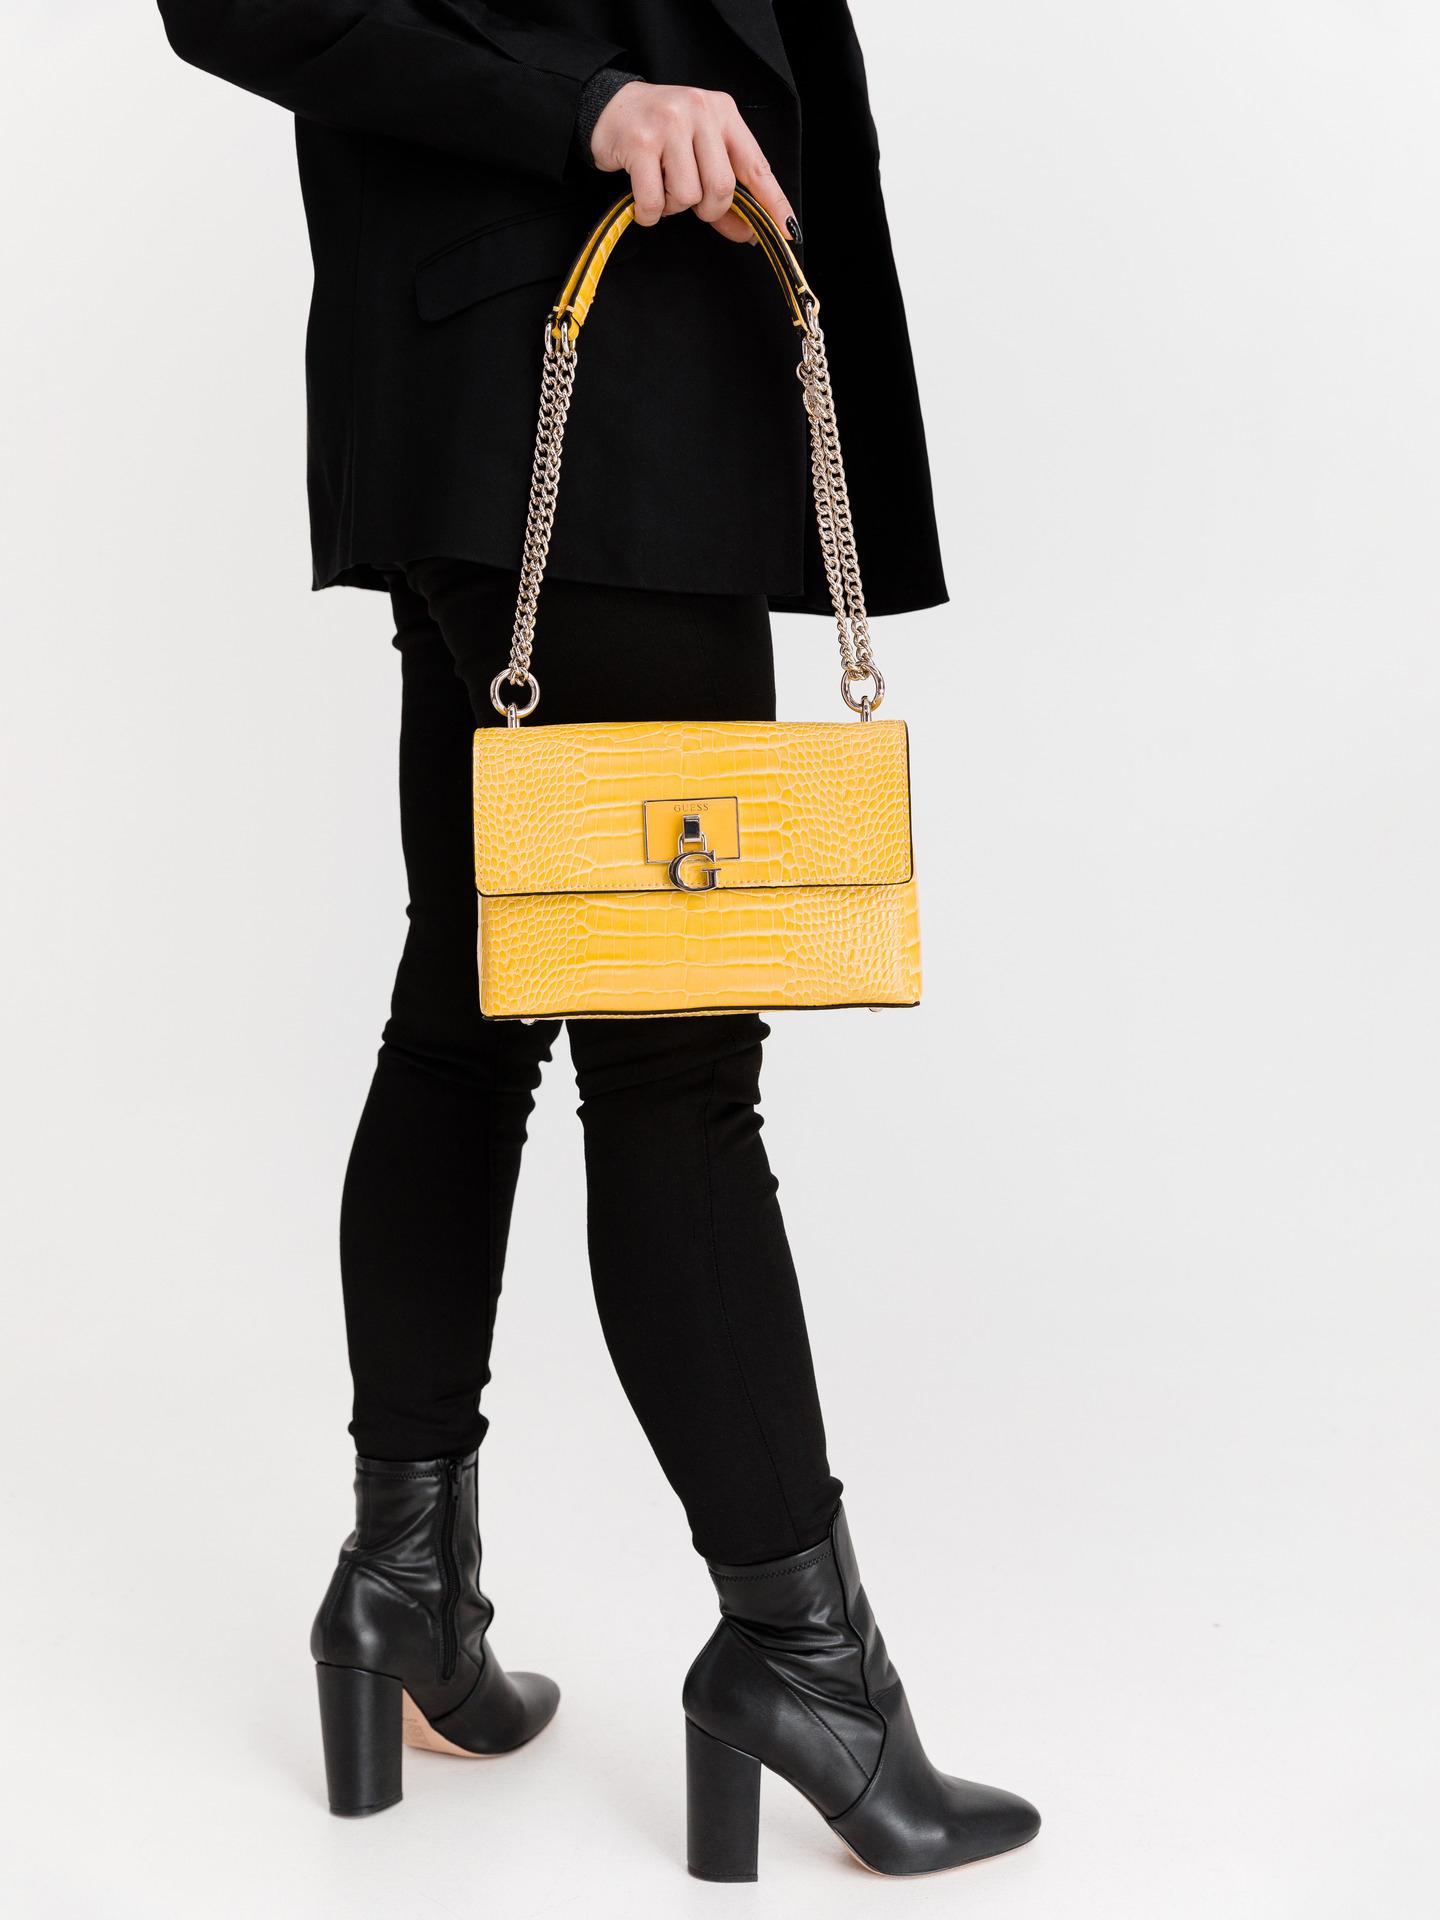 Guess yellow crossbody handbag Carabel